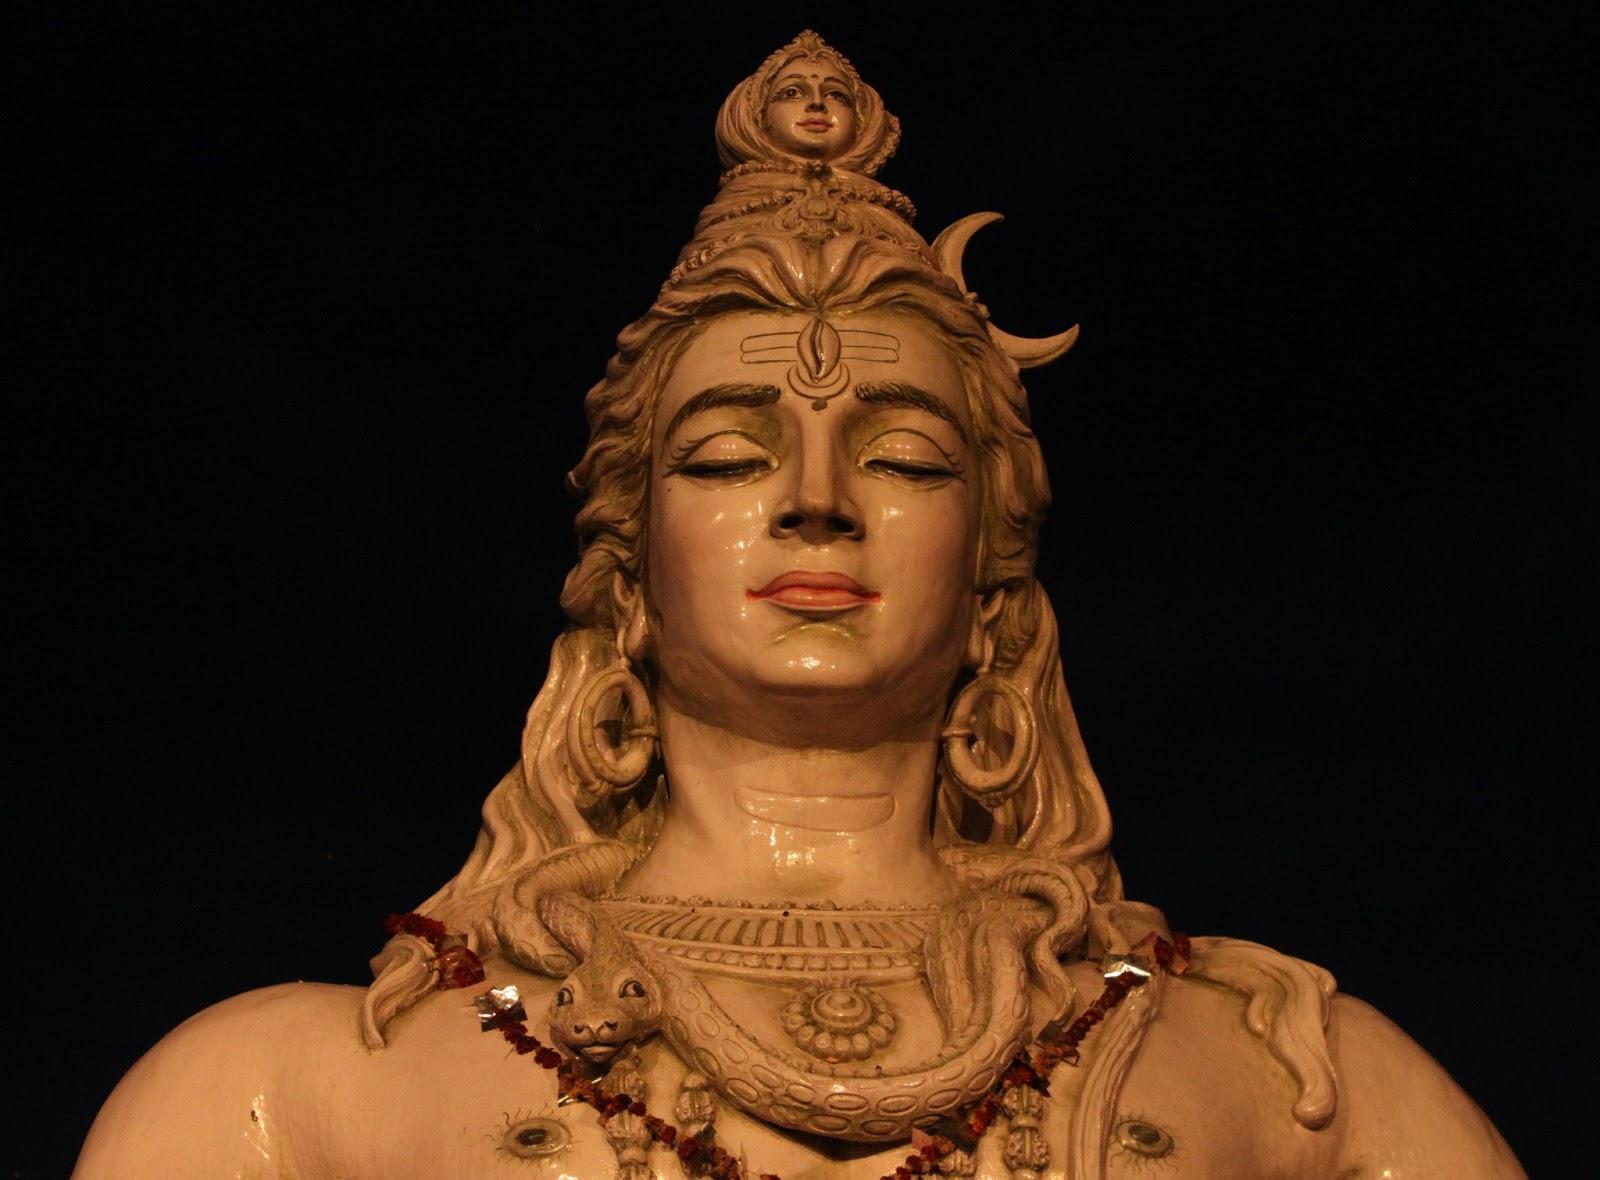 Hd wallpaper bholenath - Shiva Lord Indian God Bhagvan Shiv Shivam Bholenath Nilkanth Shivratri